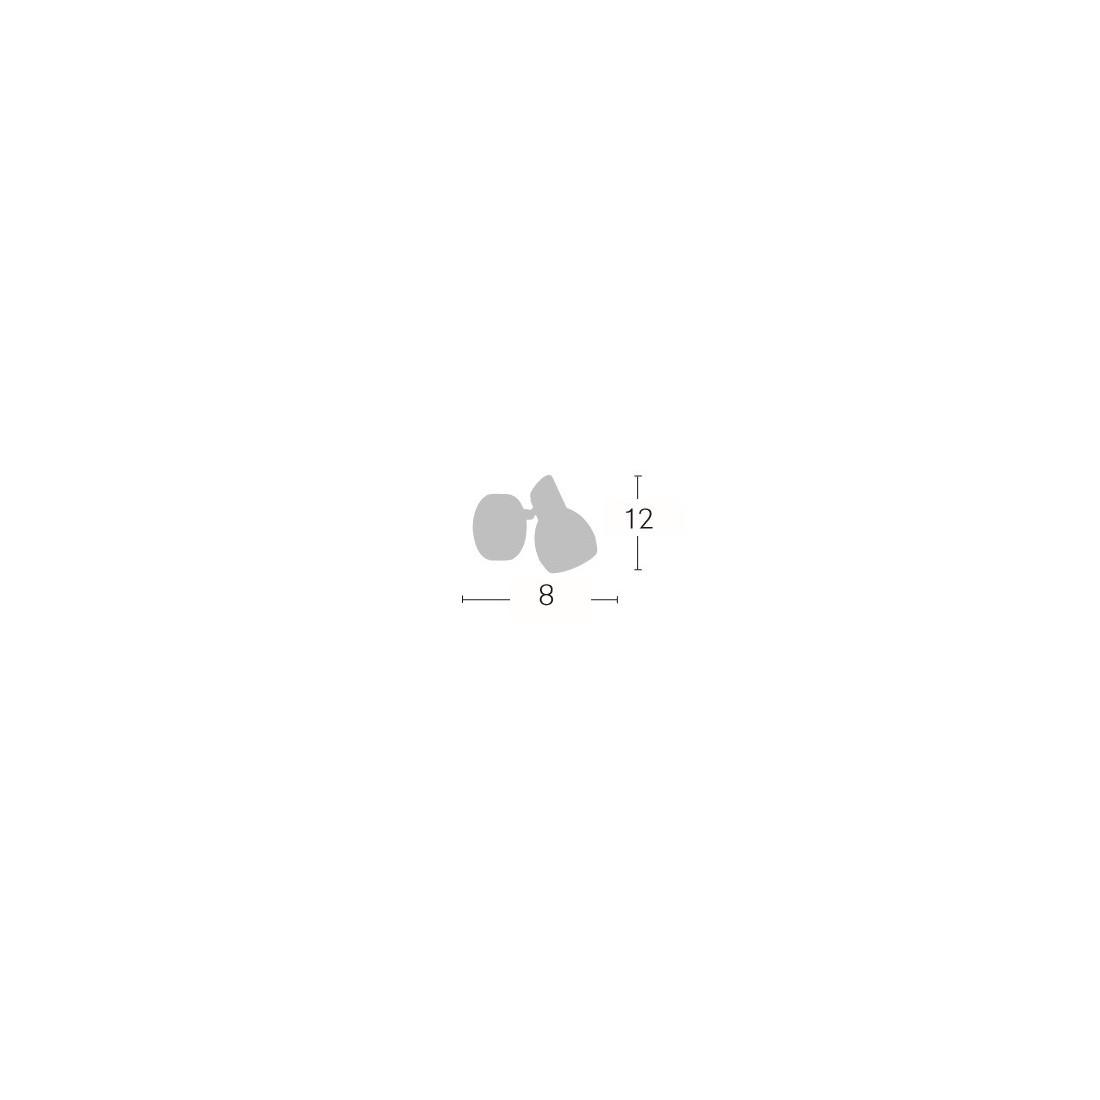 Apliques de dise o de exterior de aluminio y policarbonato - Apliques de exterior ...